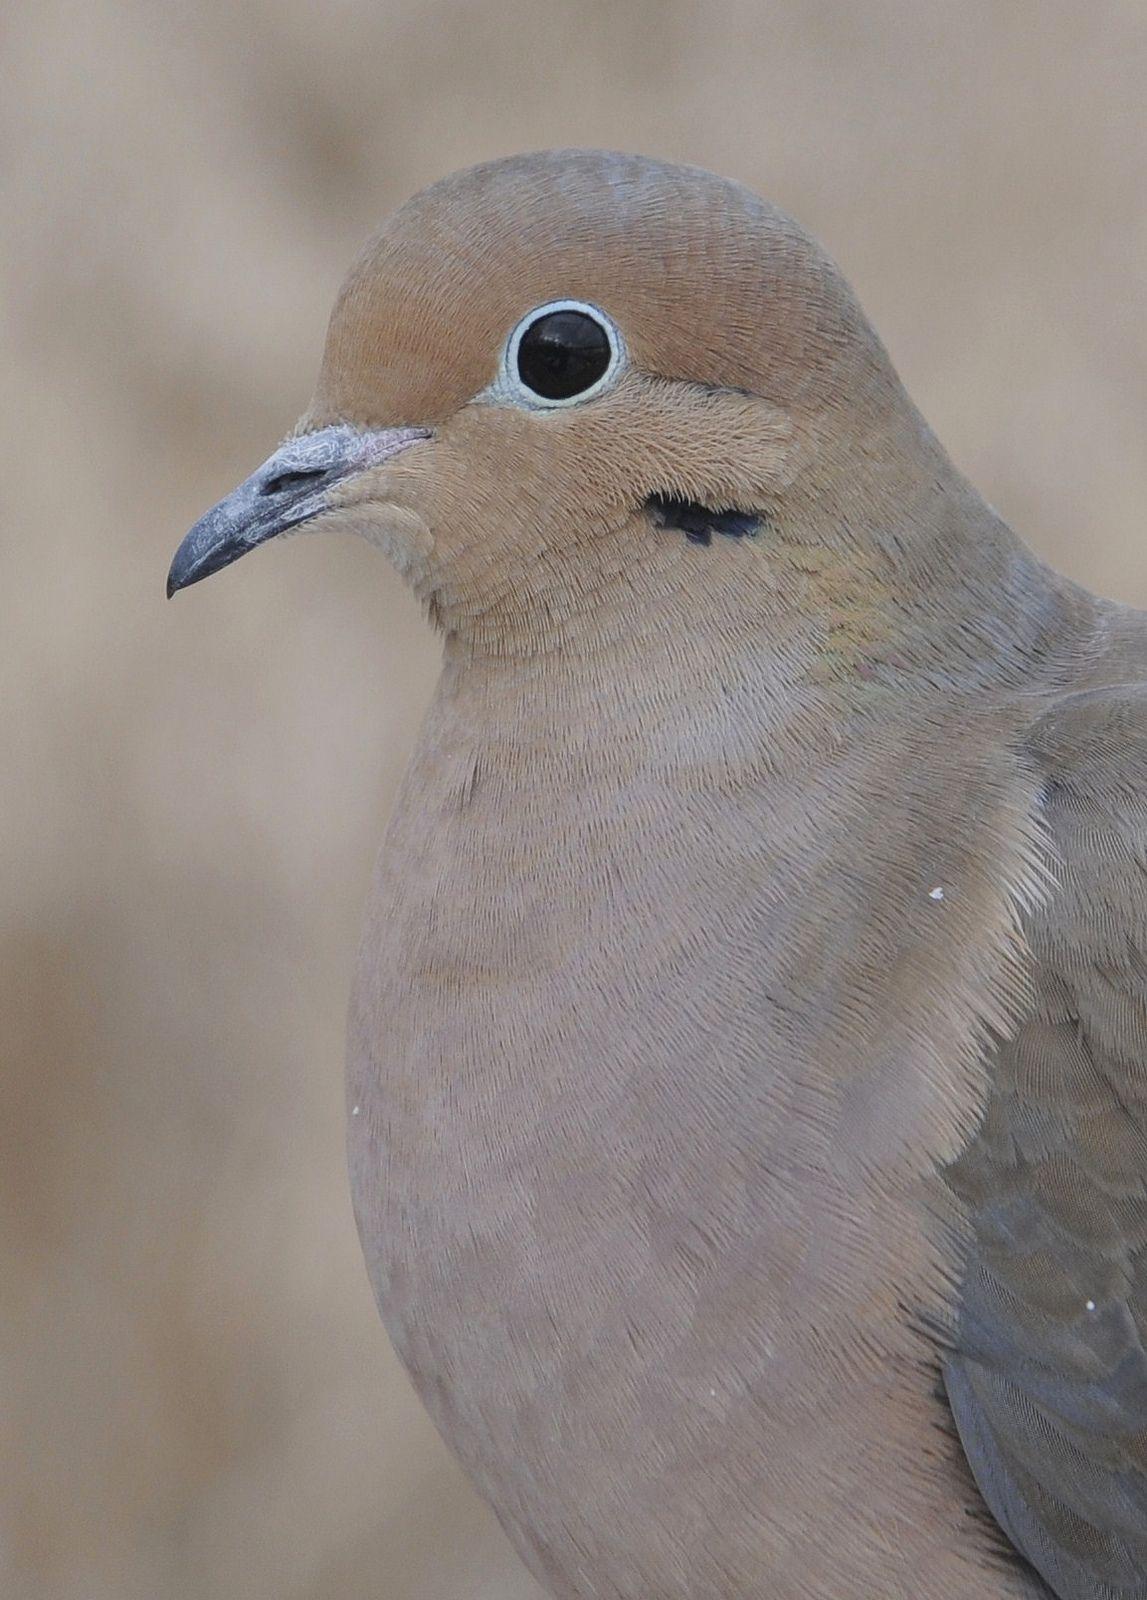 Mourning dove zenaida macroura mourning dove bird and httpsflicpdvarsh mourning dove buycottarizona